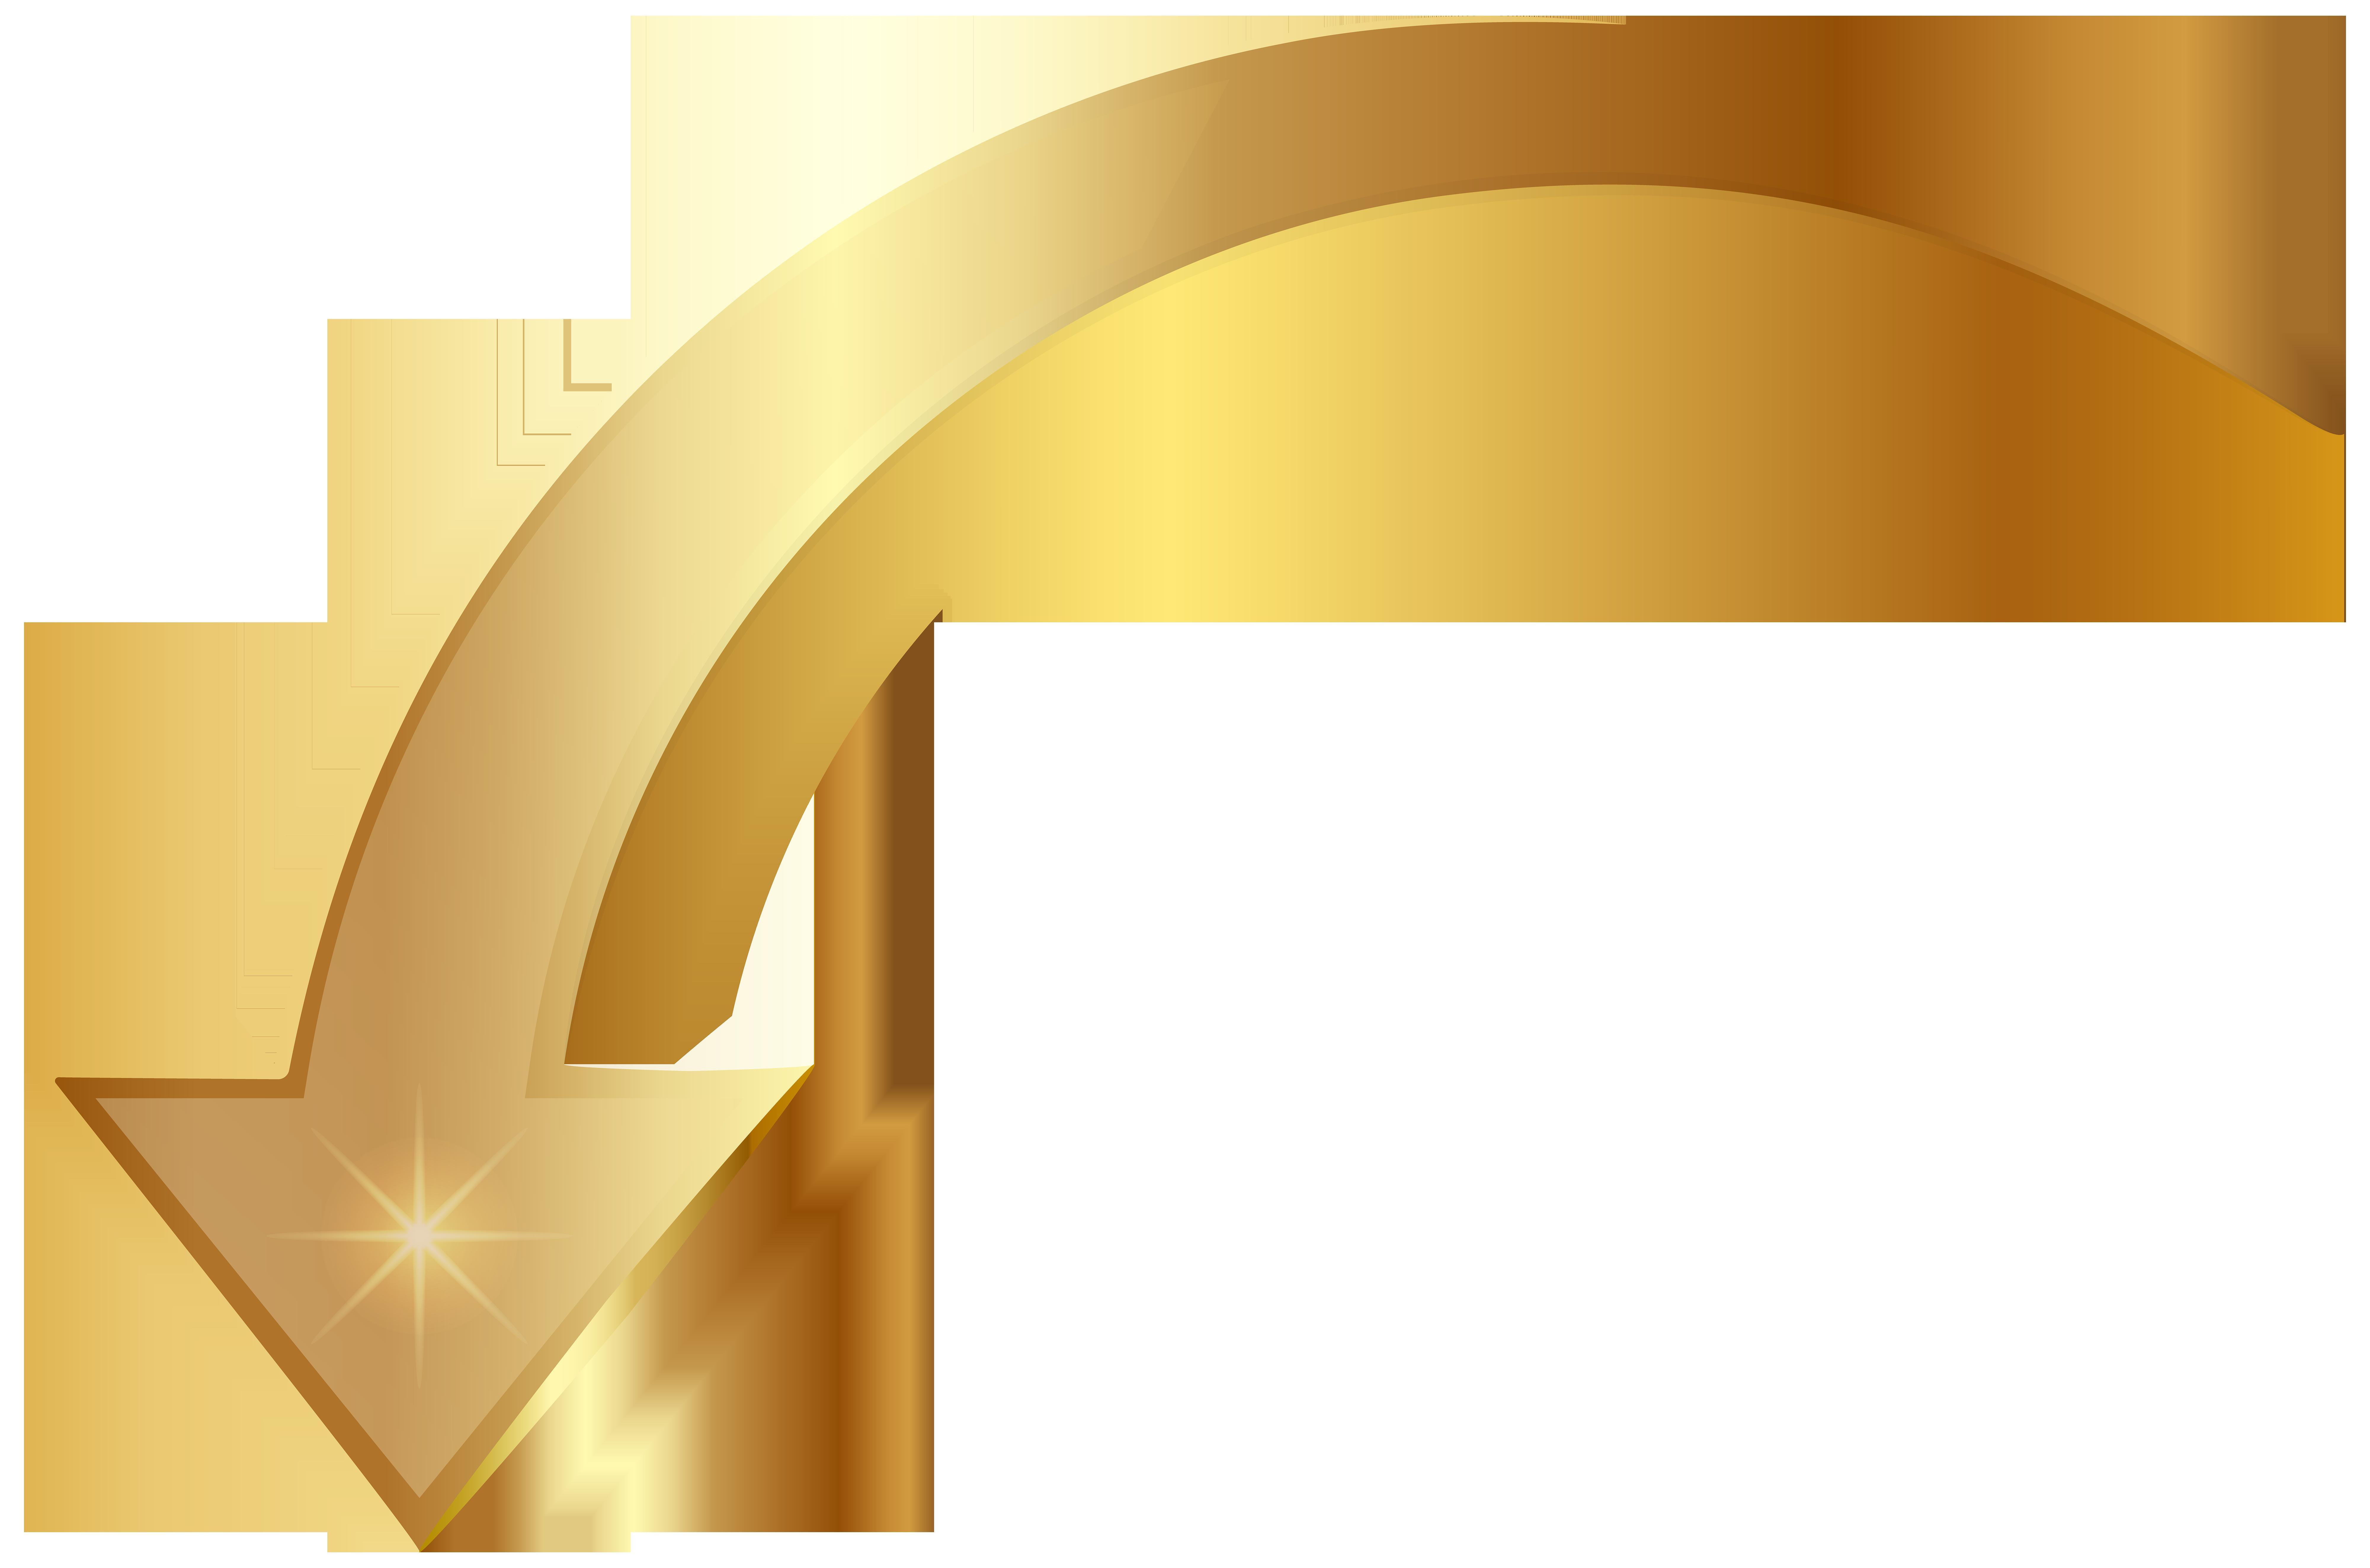 vector free download Png clip art image. Gold arrow clipart